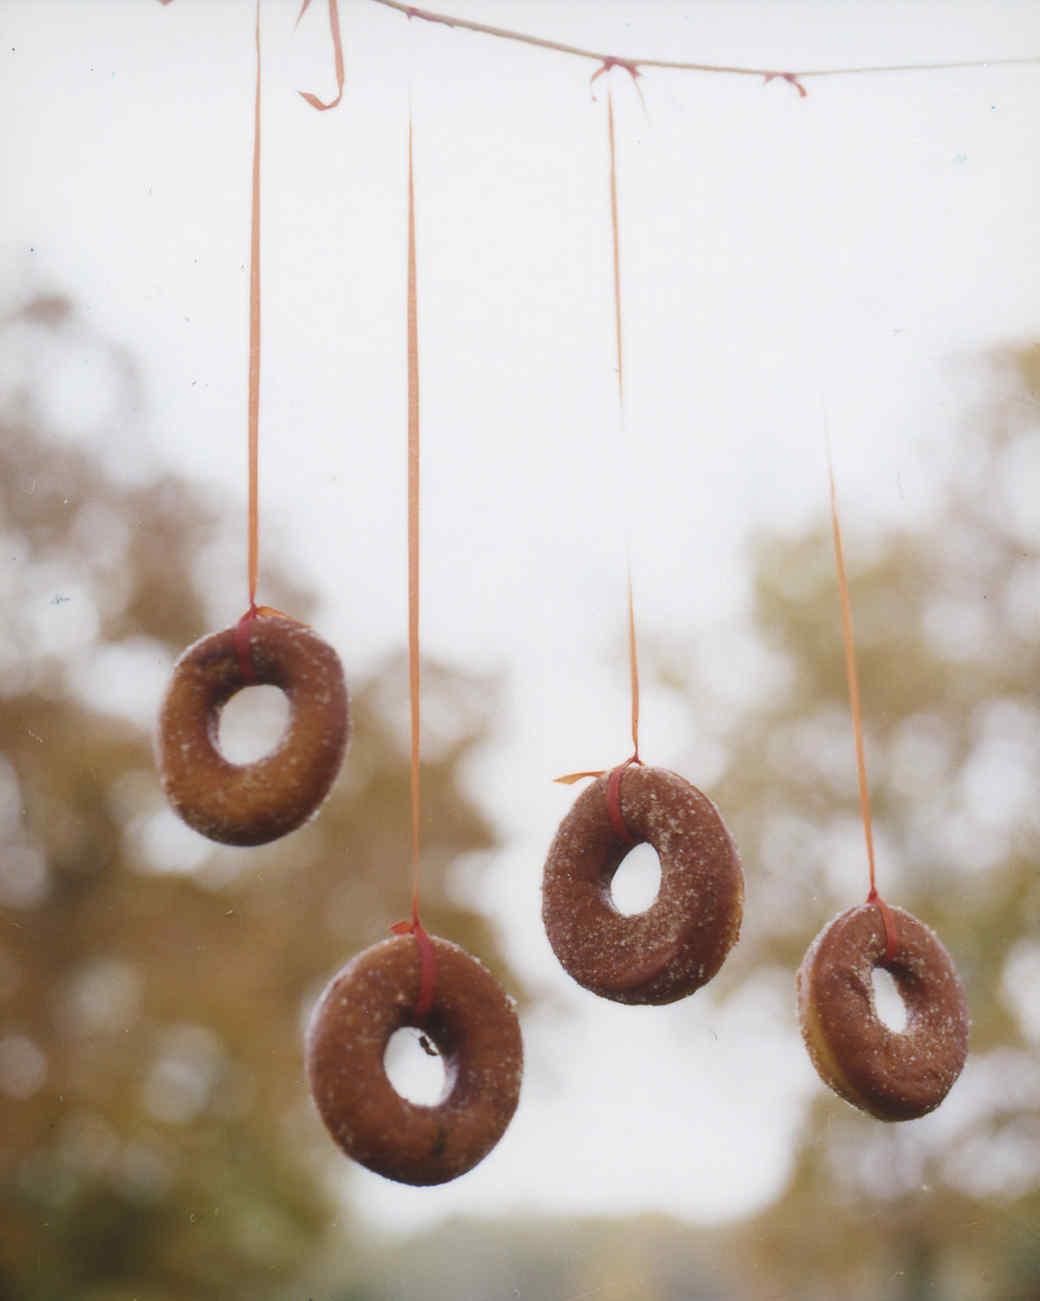 Doughnuts on a string. Doughnut clipart small donut